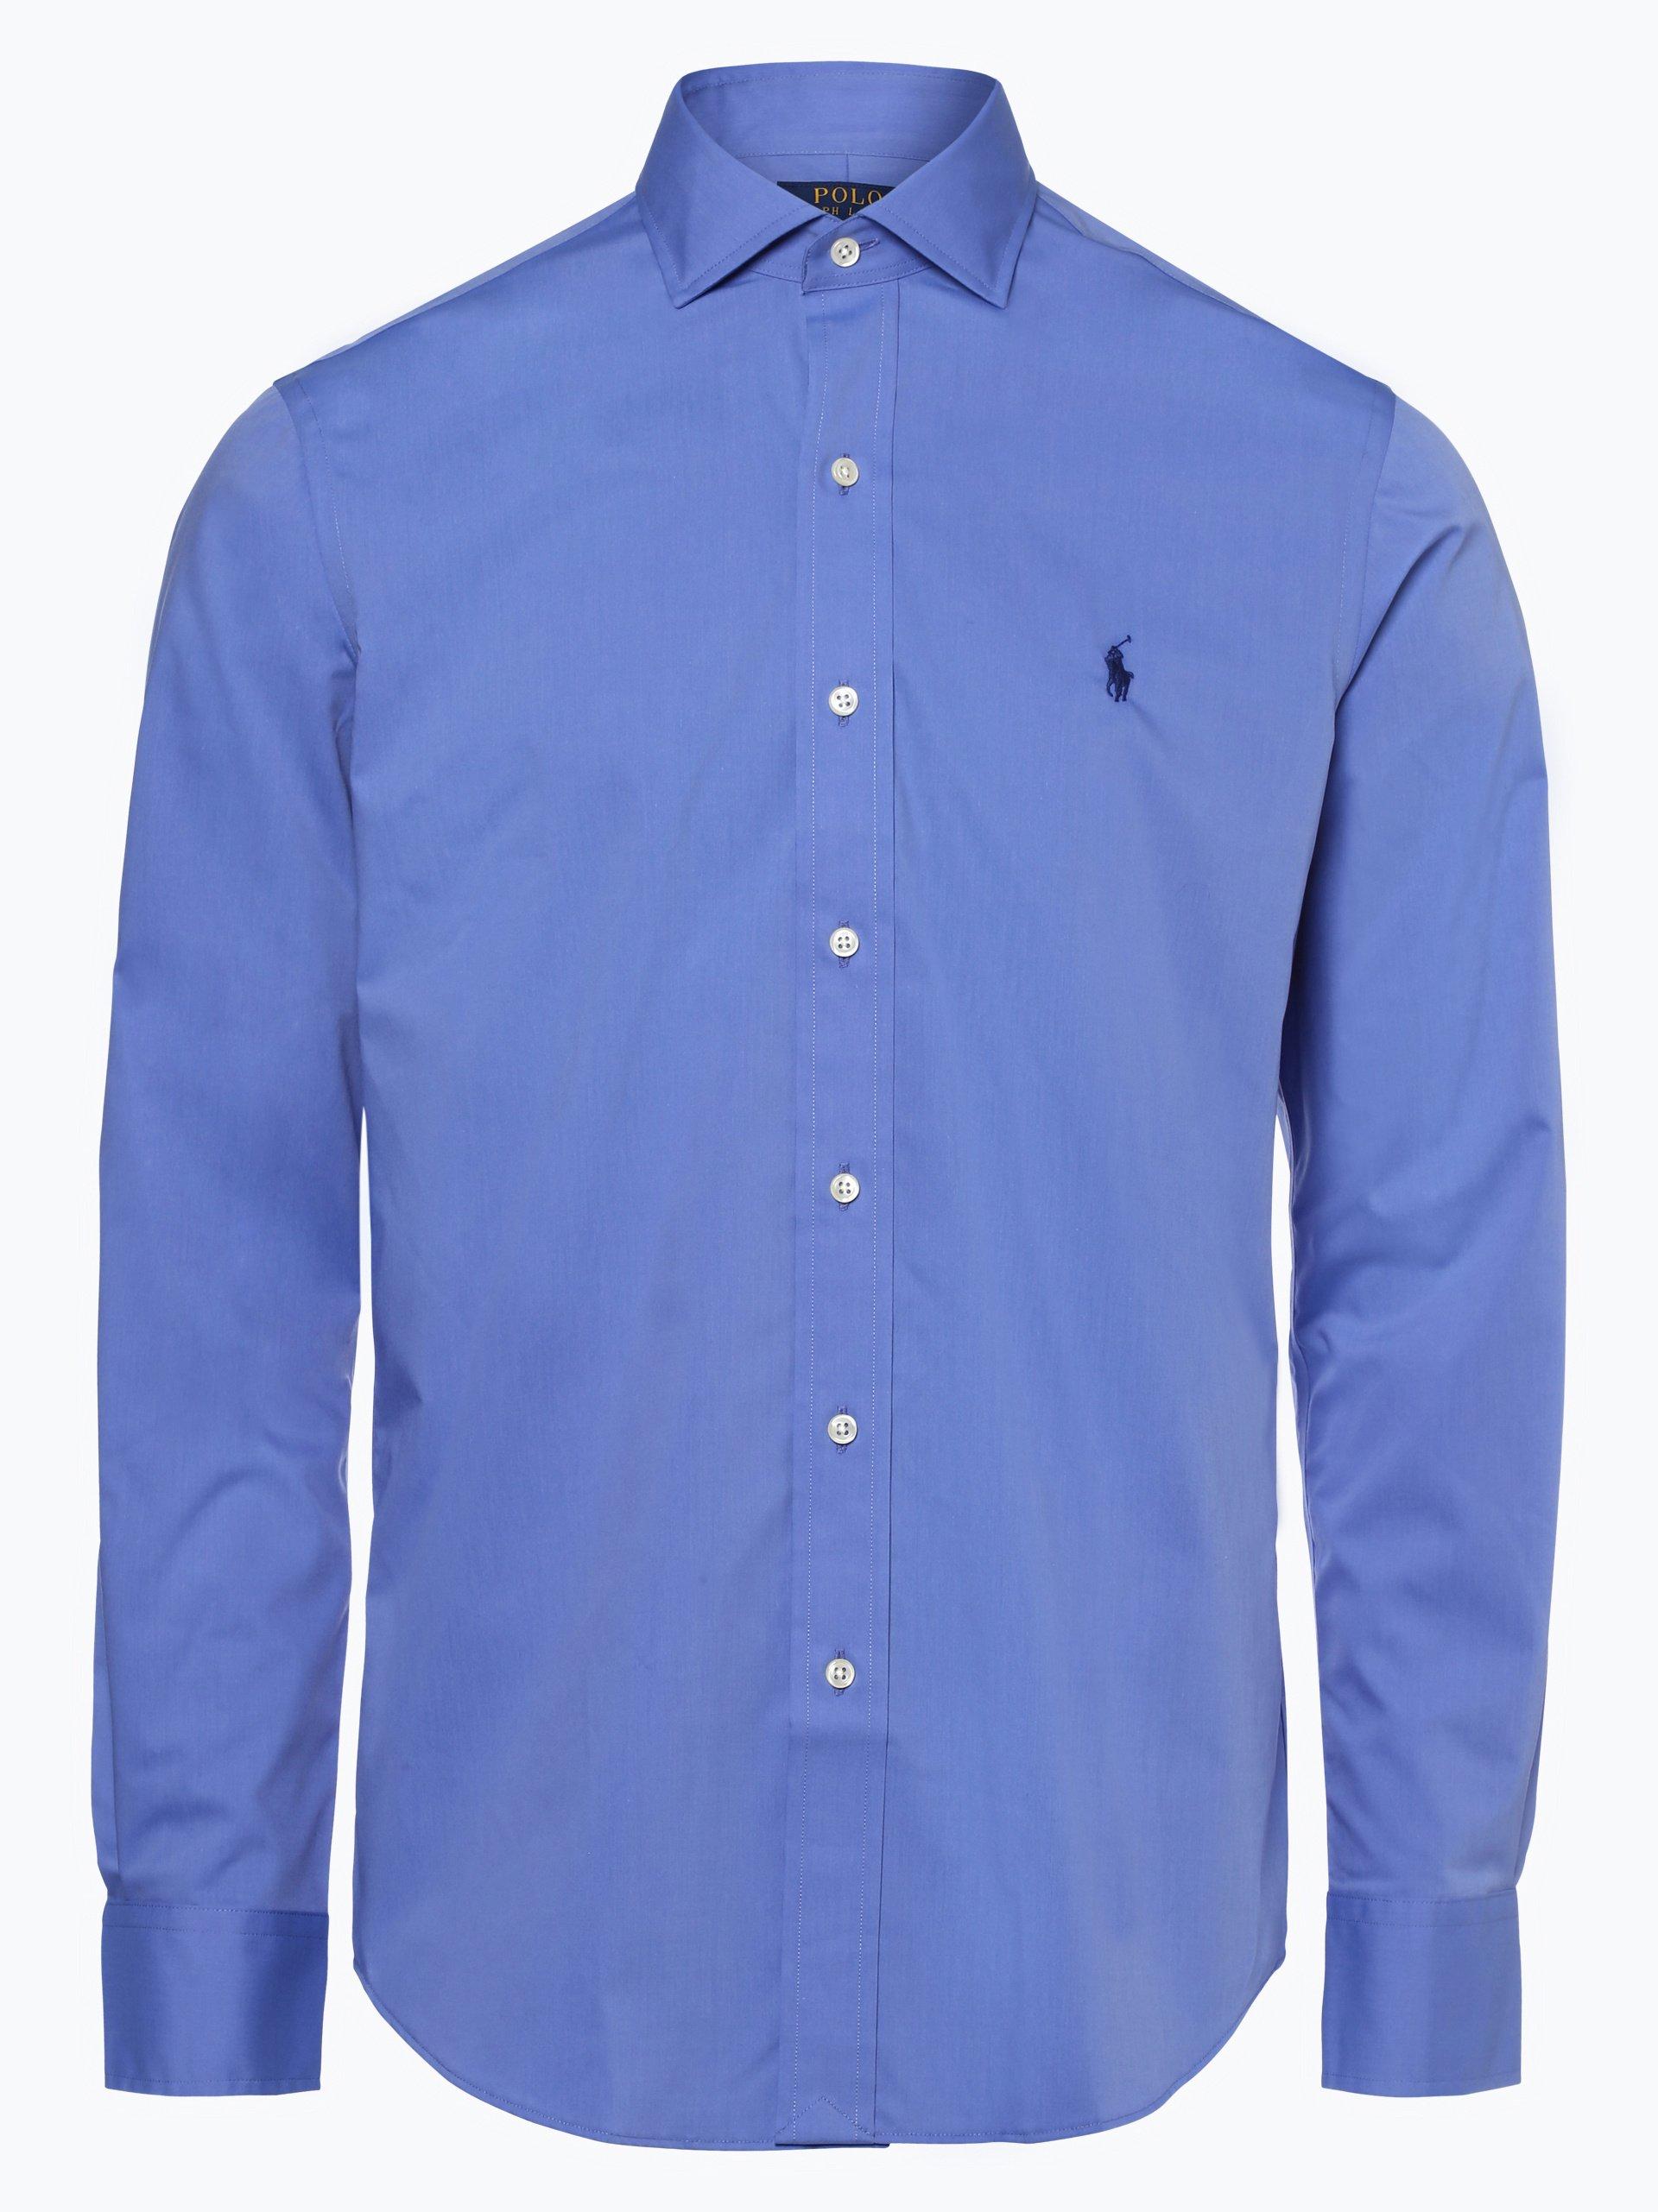 polo ralph lauren herren hemd b gelleicht blau uni online kaufen vangraaf com. Black Bedroom Furniture Sets. Home Design Ideas